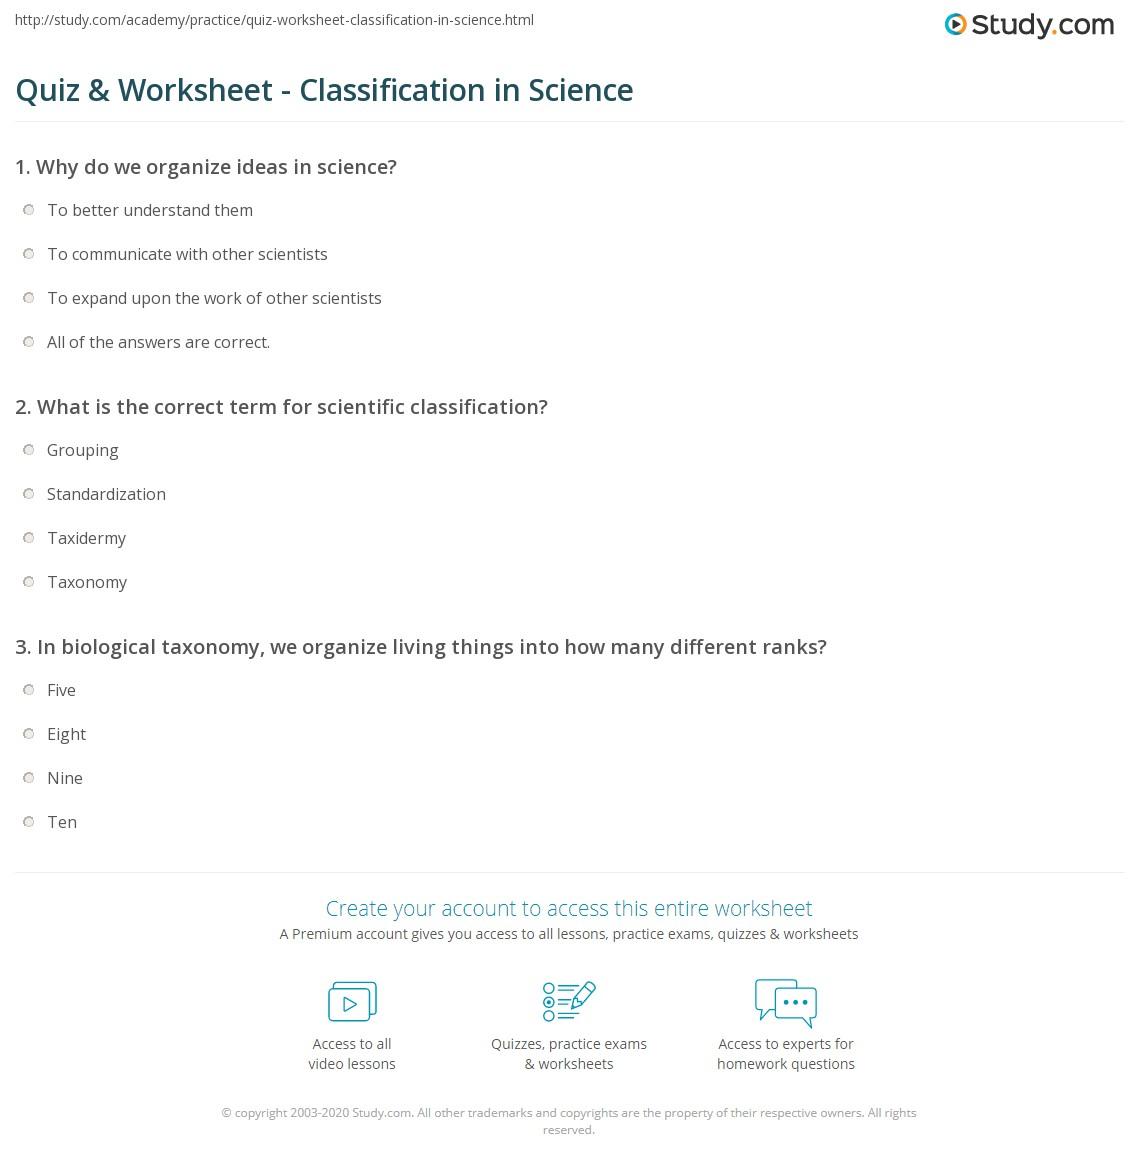 Quiz & Worksheet - Classification in Science | Study.com